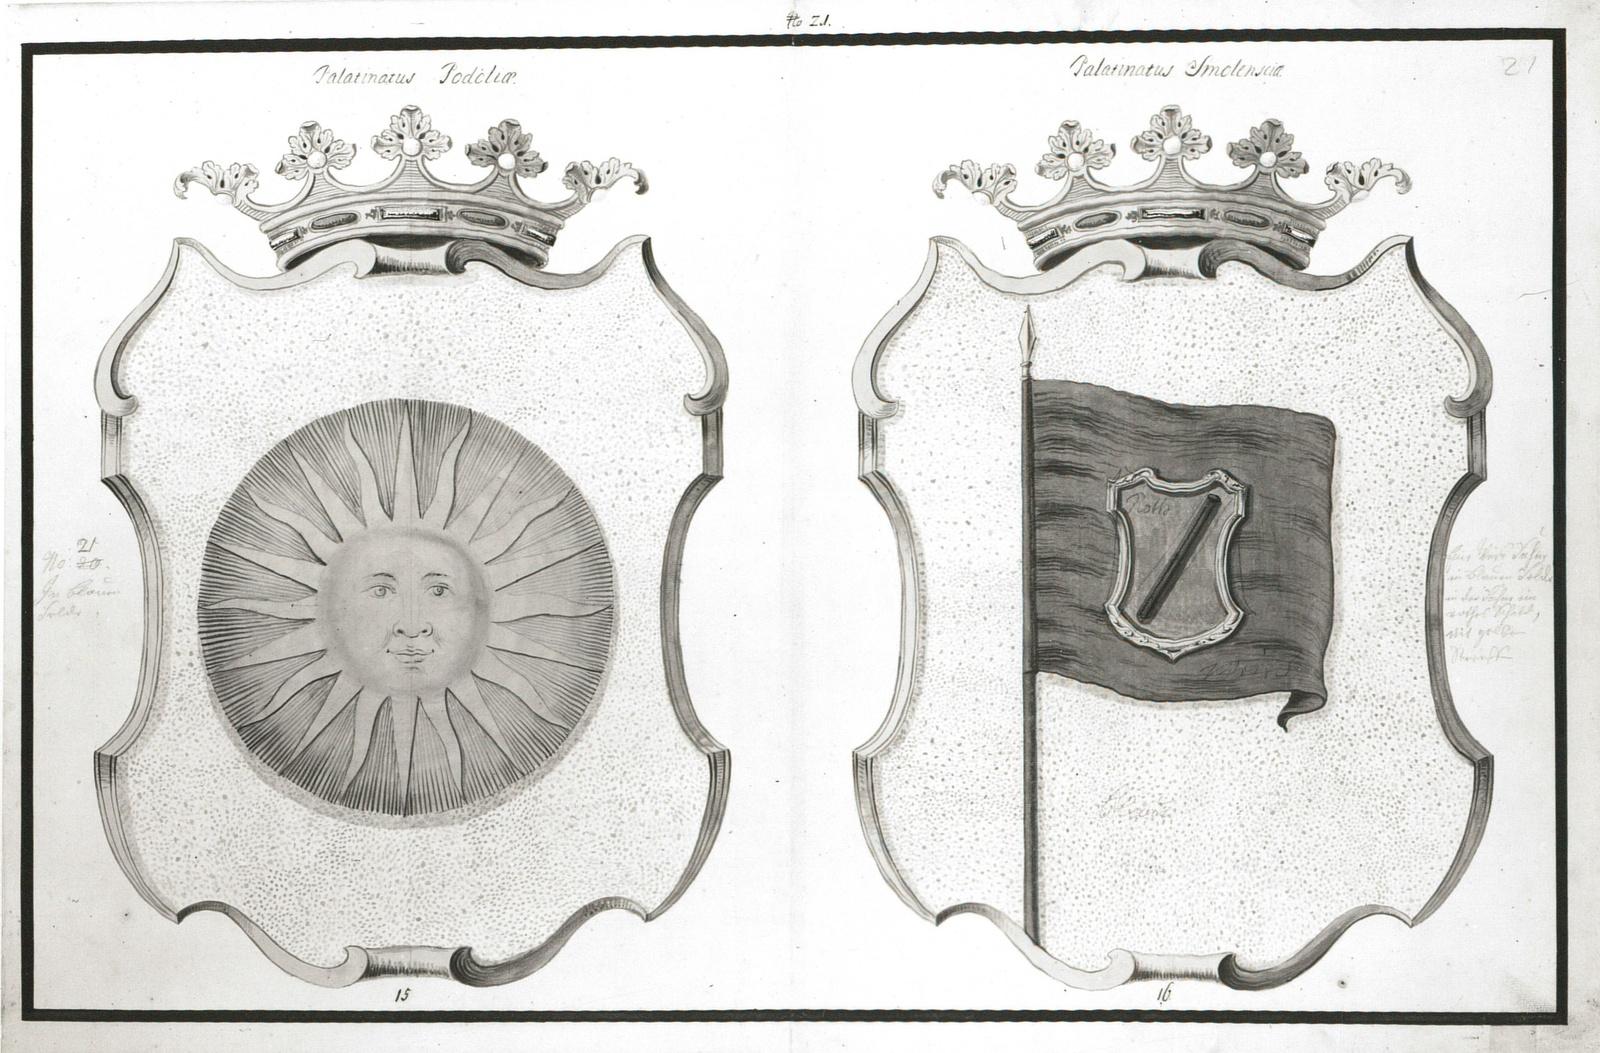 Coat of arms of Smolensk: history, description, interpretation of symbols 70